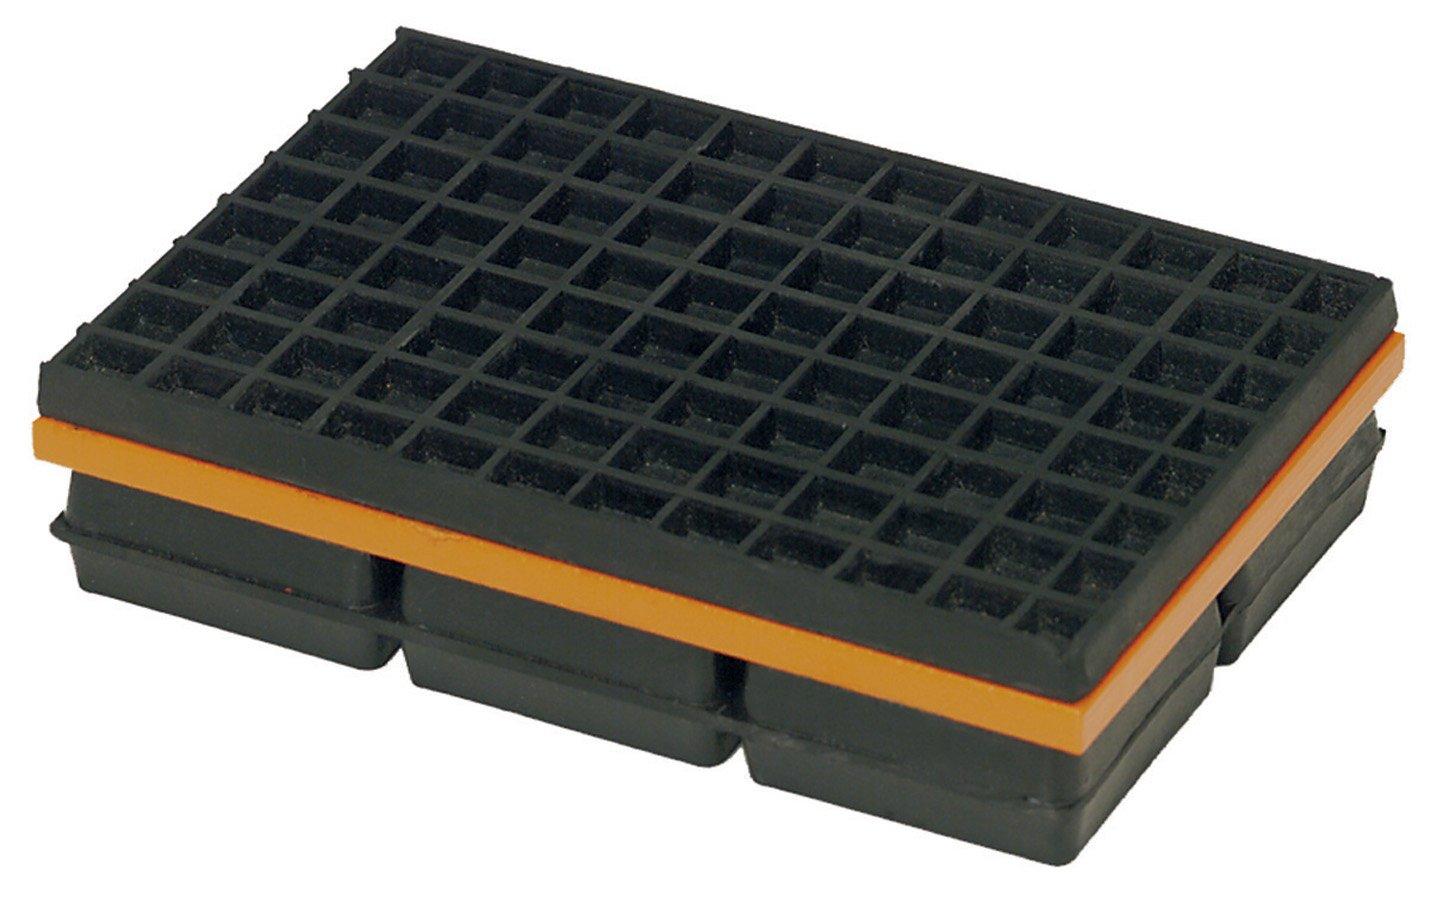 MASON Neoprene Vibration Isolation Pad,600lb,PK2 20UZ18